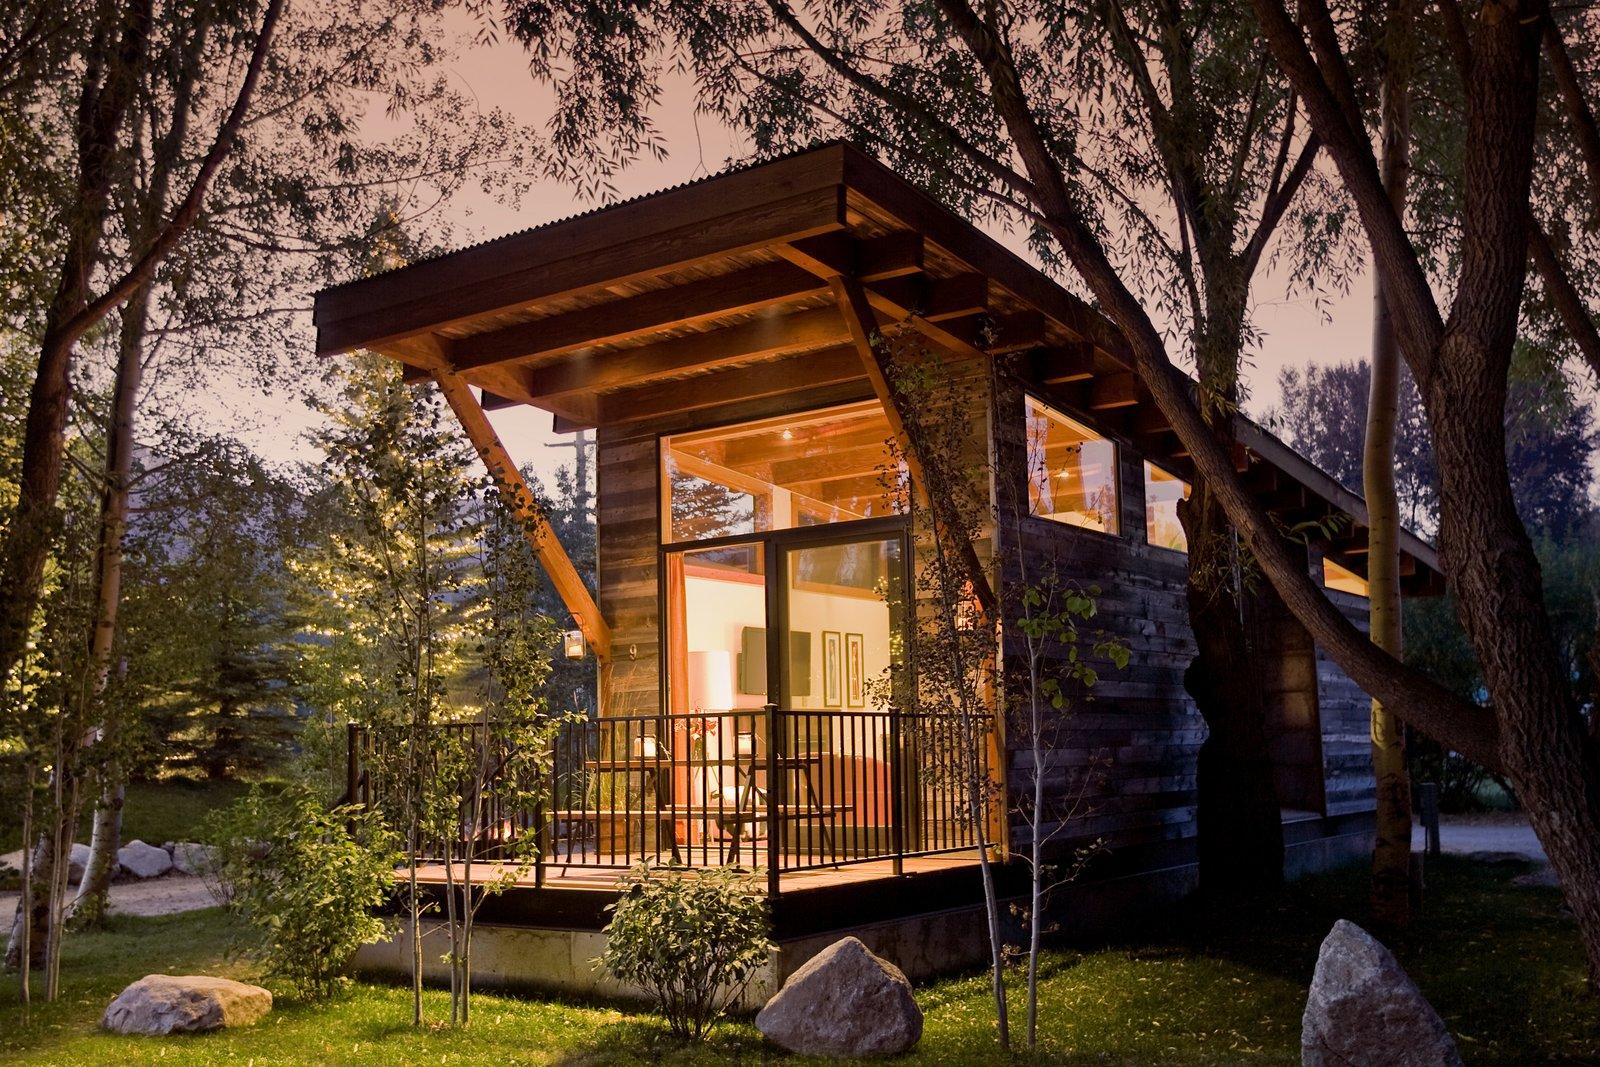 Wedge tiny home exterior